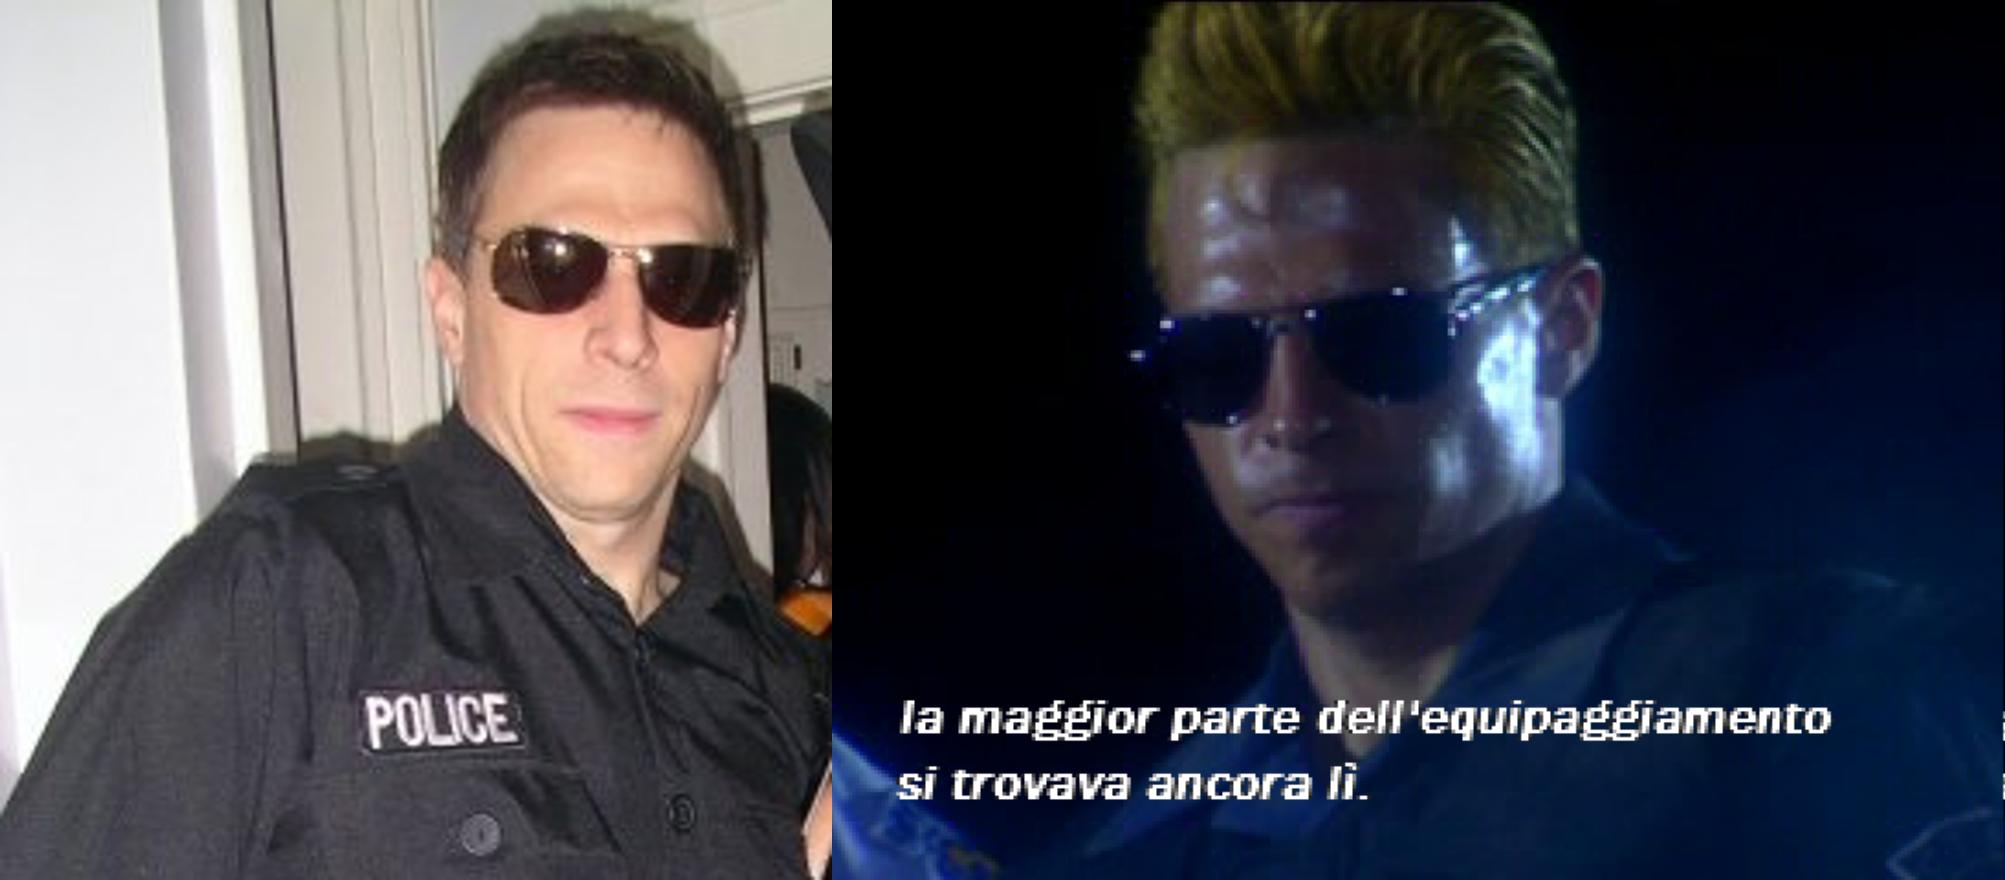 Eric Pirius Resident Evil Wiki Fandom